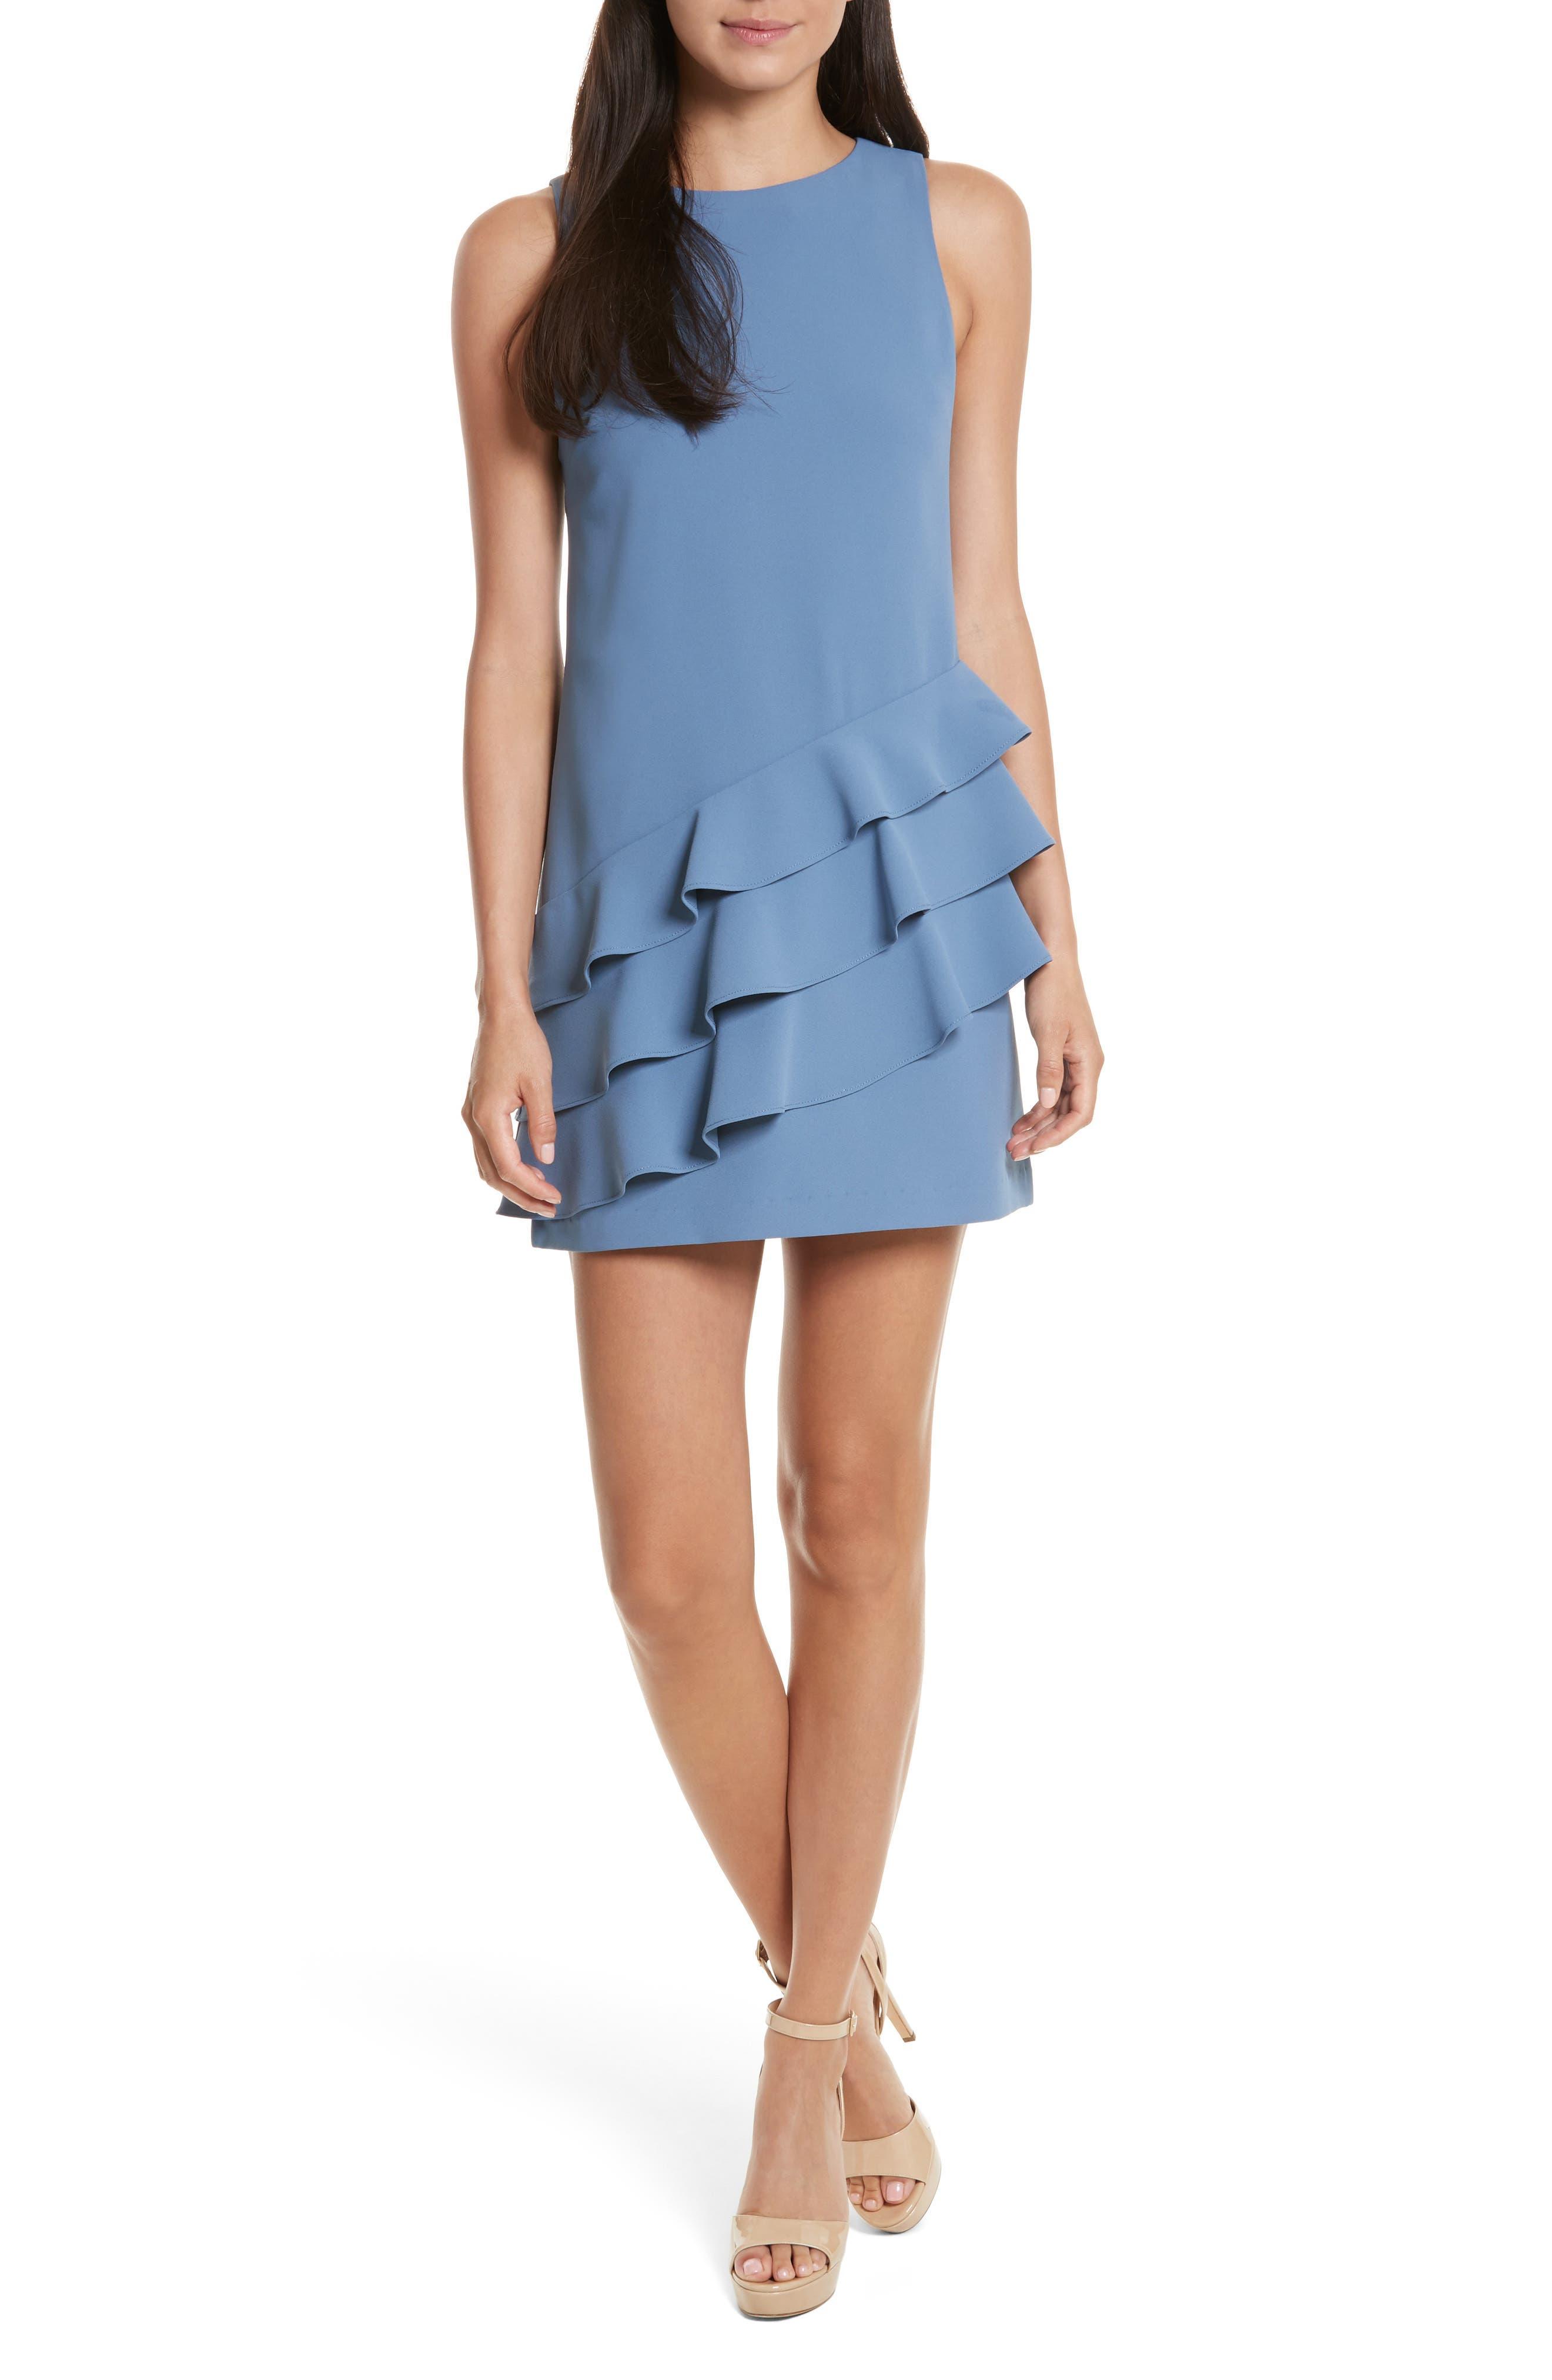 Alice + Olivia Clive Asymmetrical Ruffle A-Line Dress